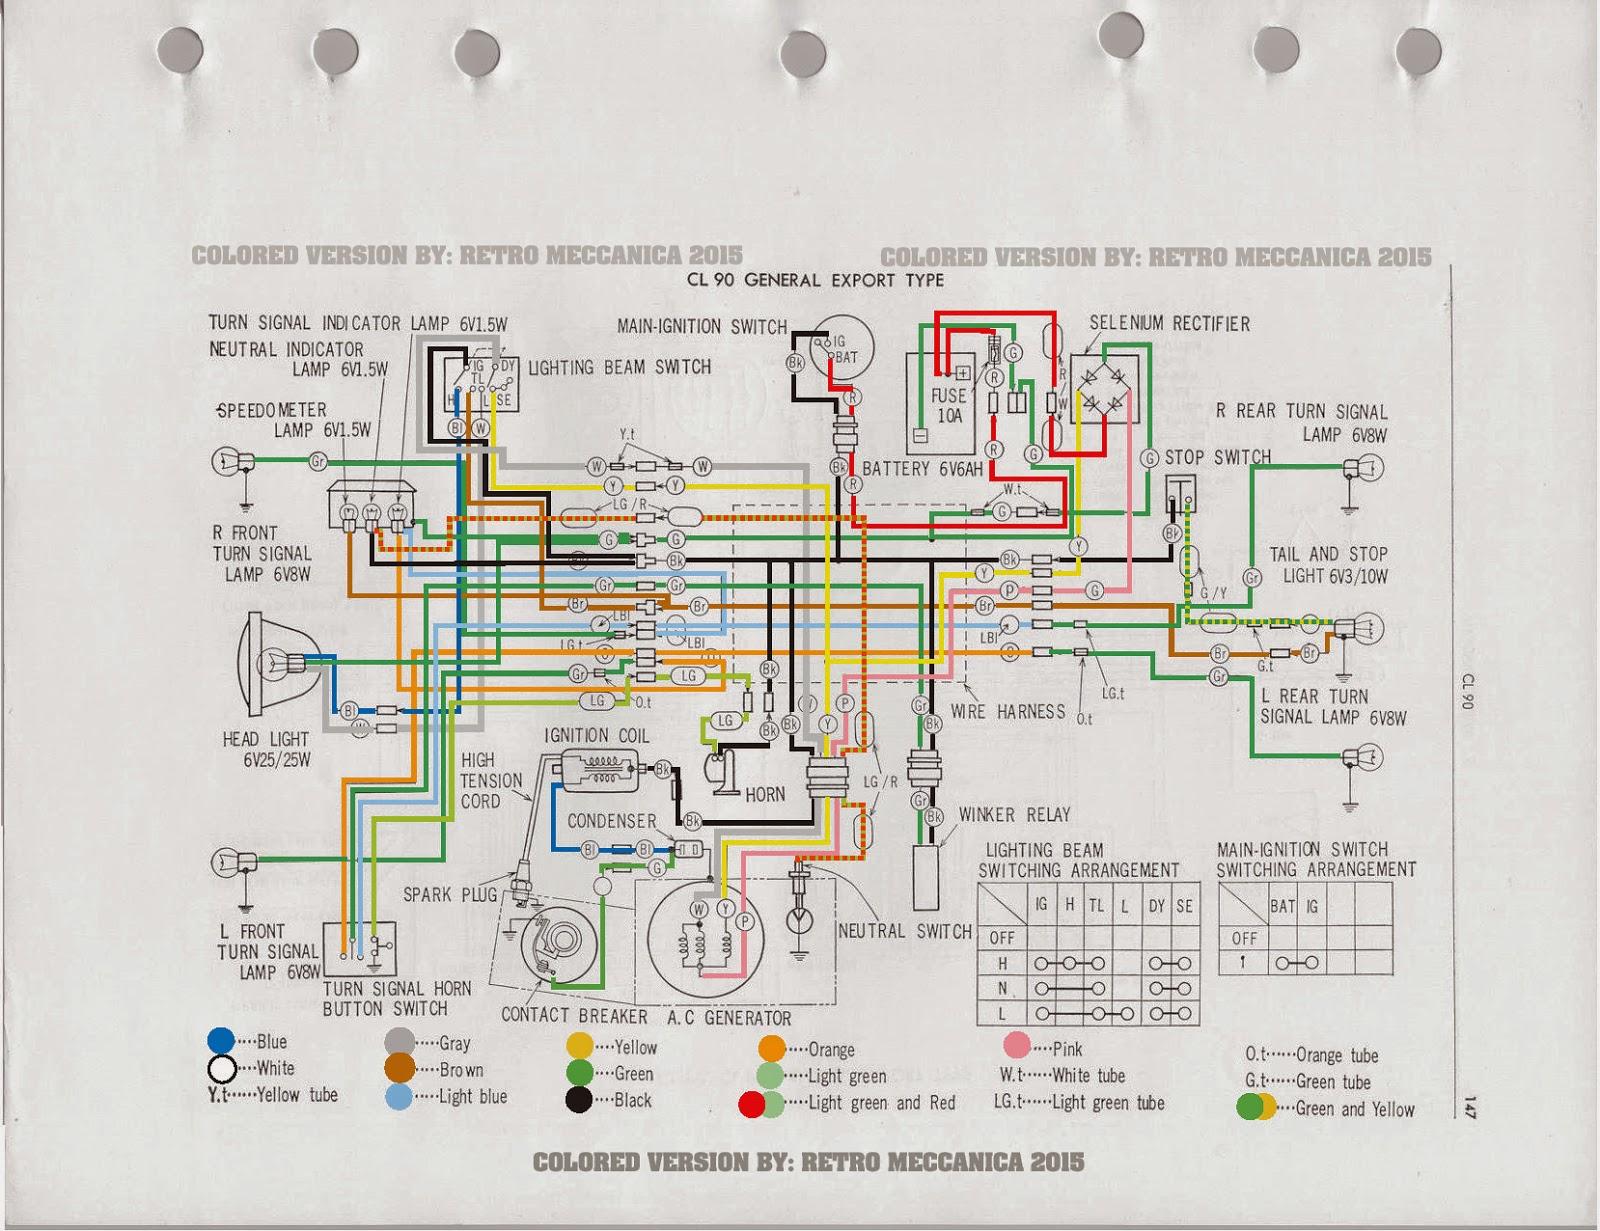 Modern Rectifier Upgrade & Electrical Wiring ~ Retromech